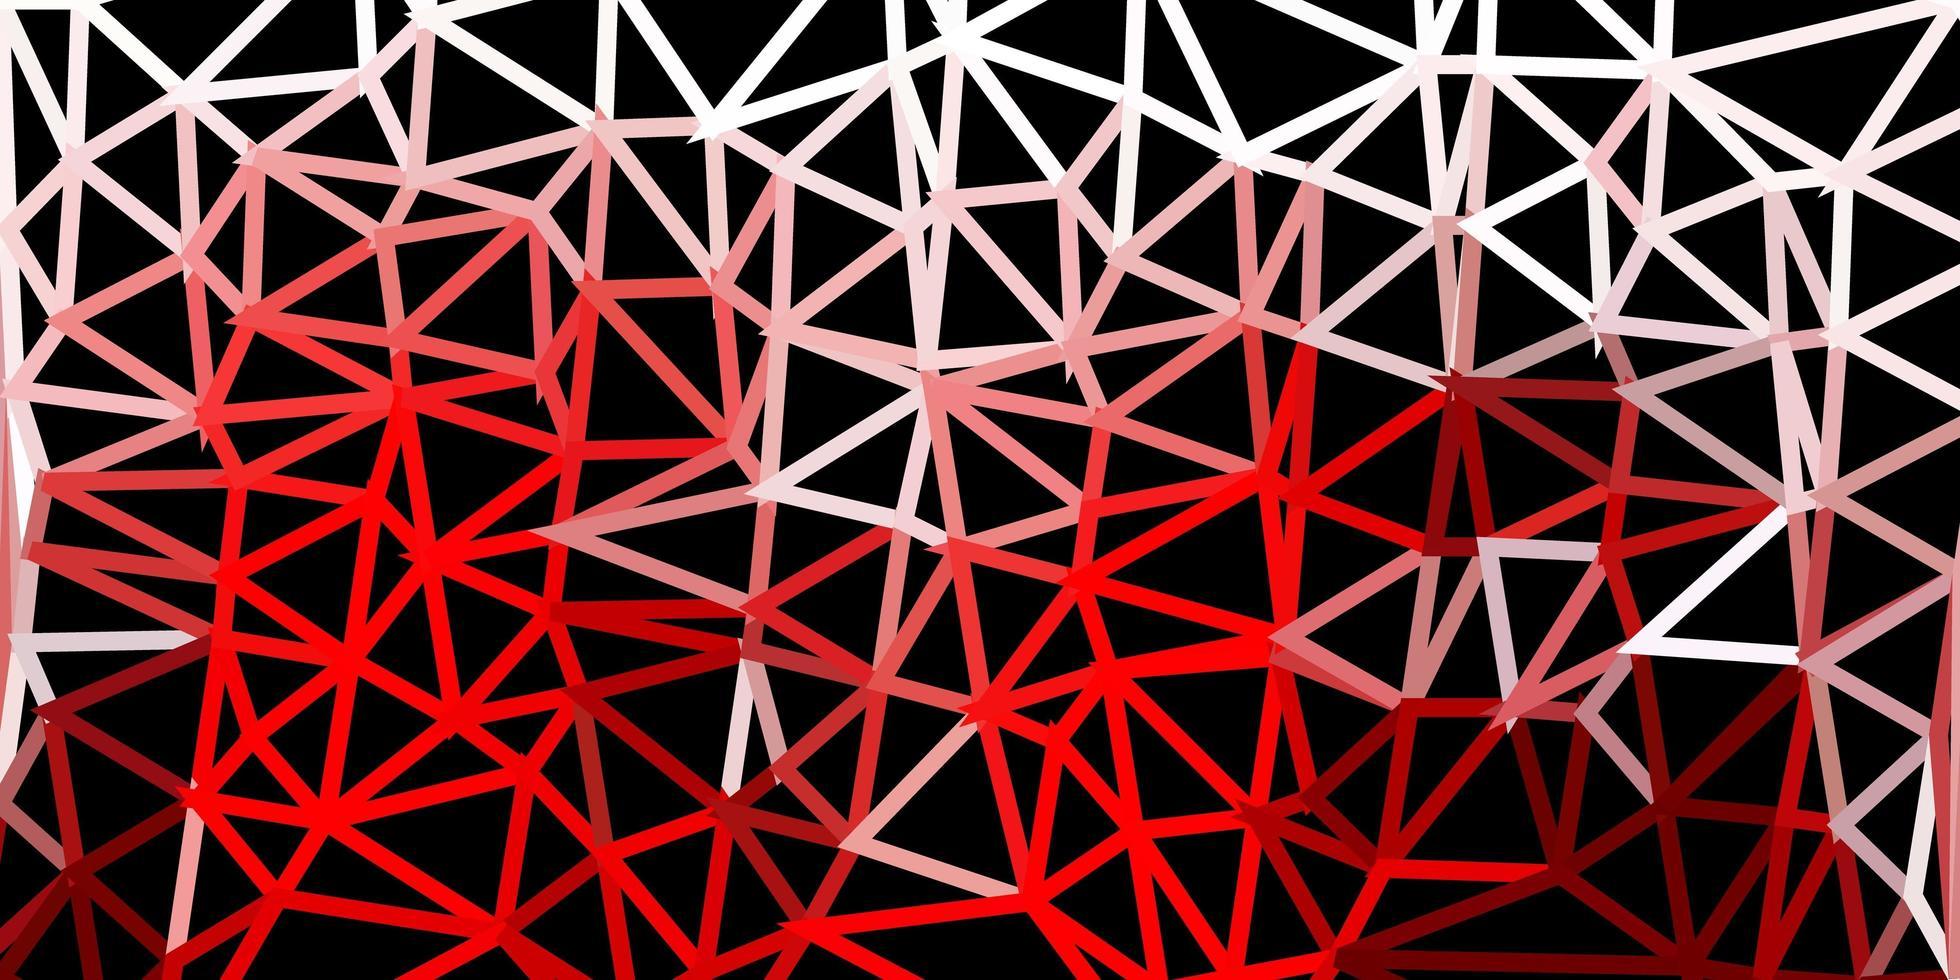 donkerrode poly driehoeksjabloon. vector